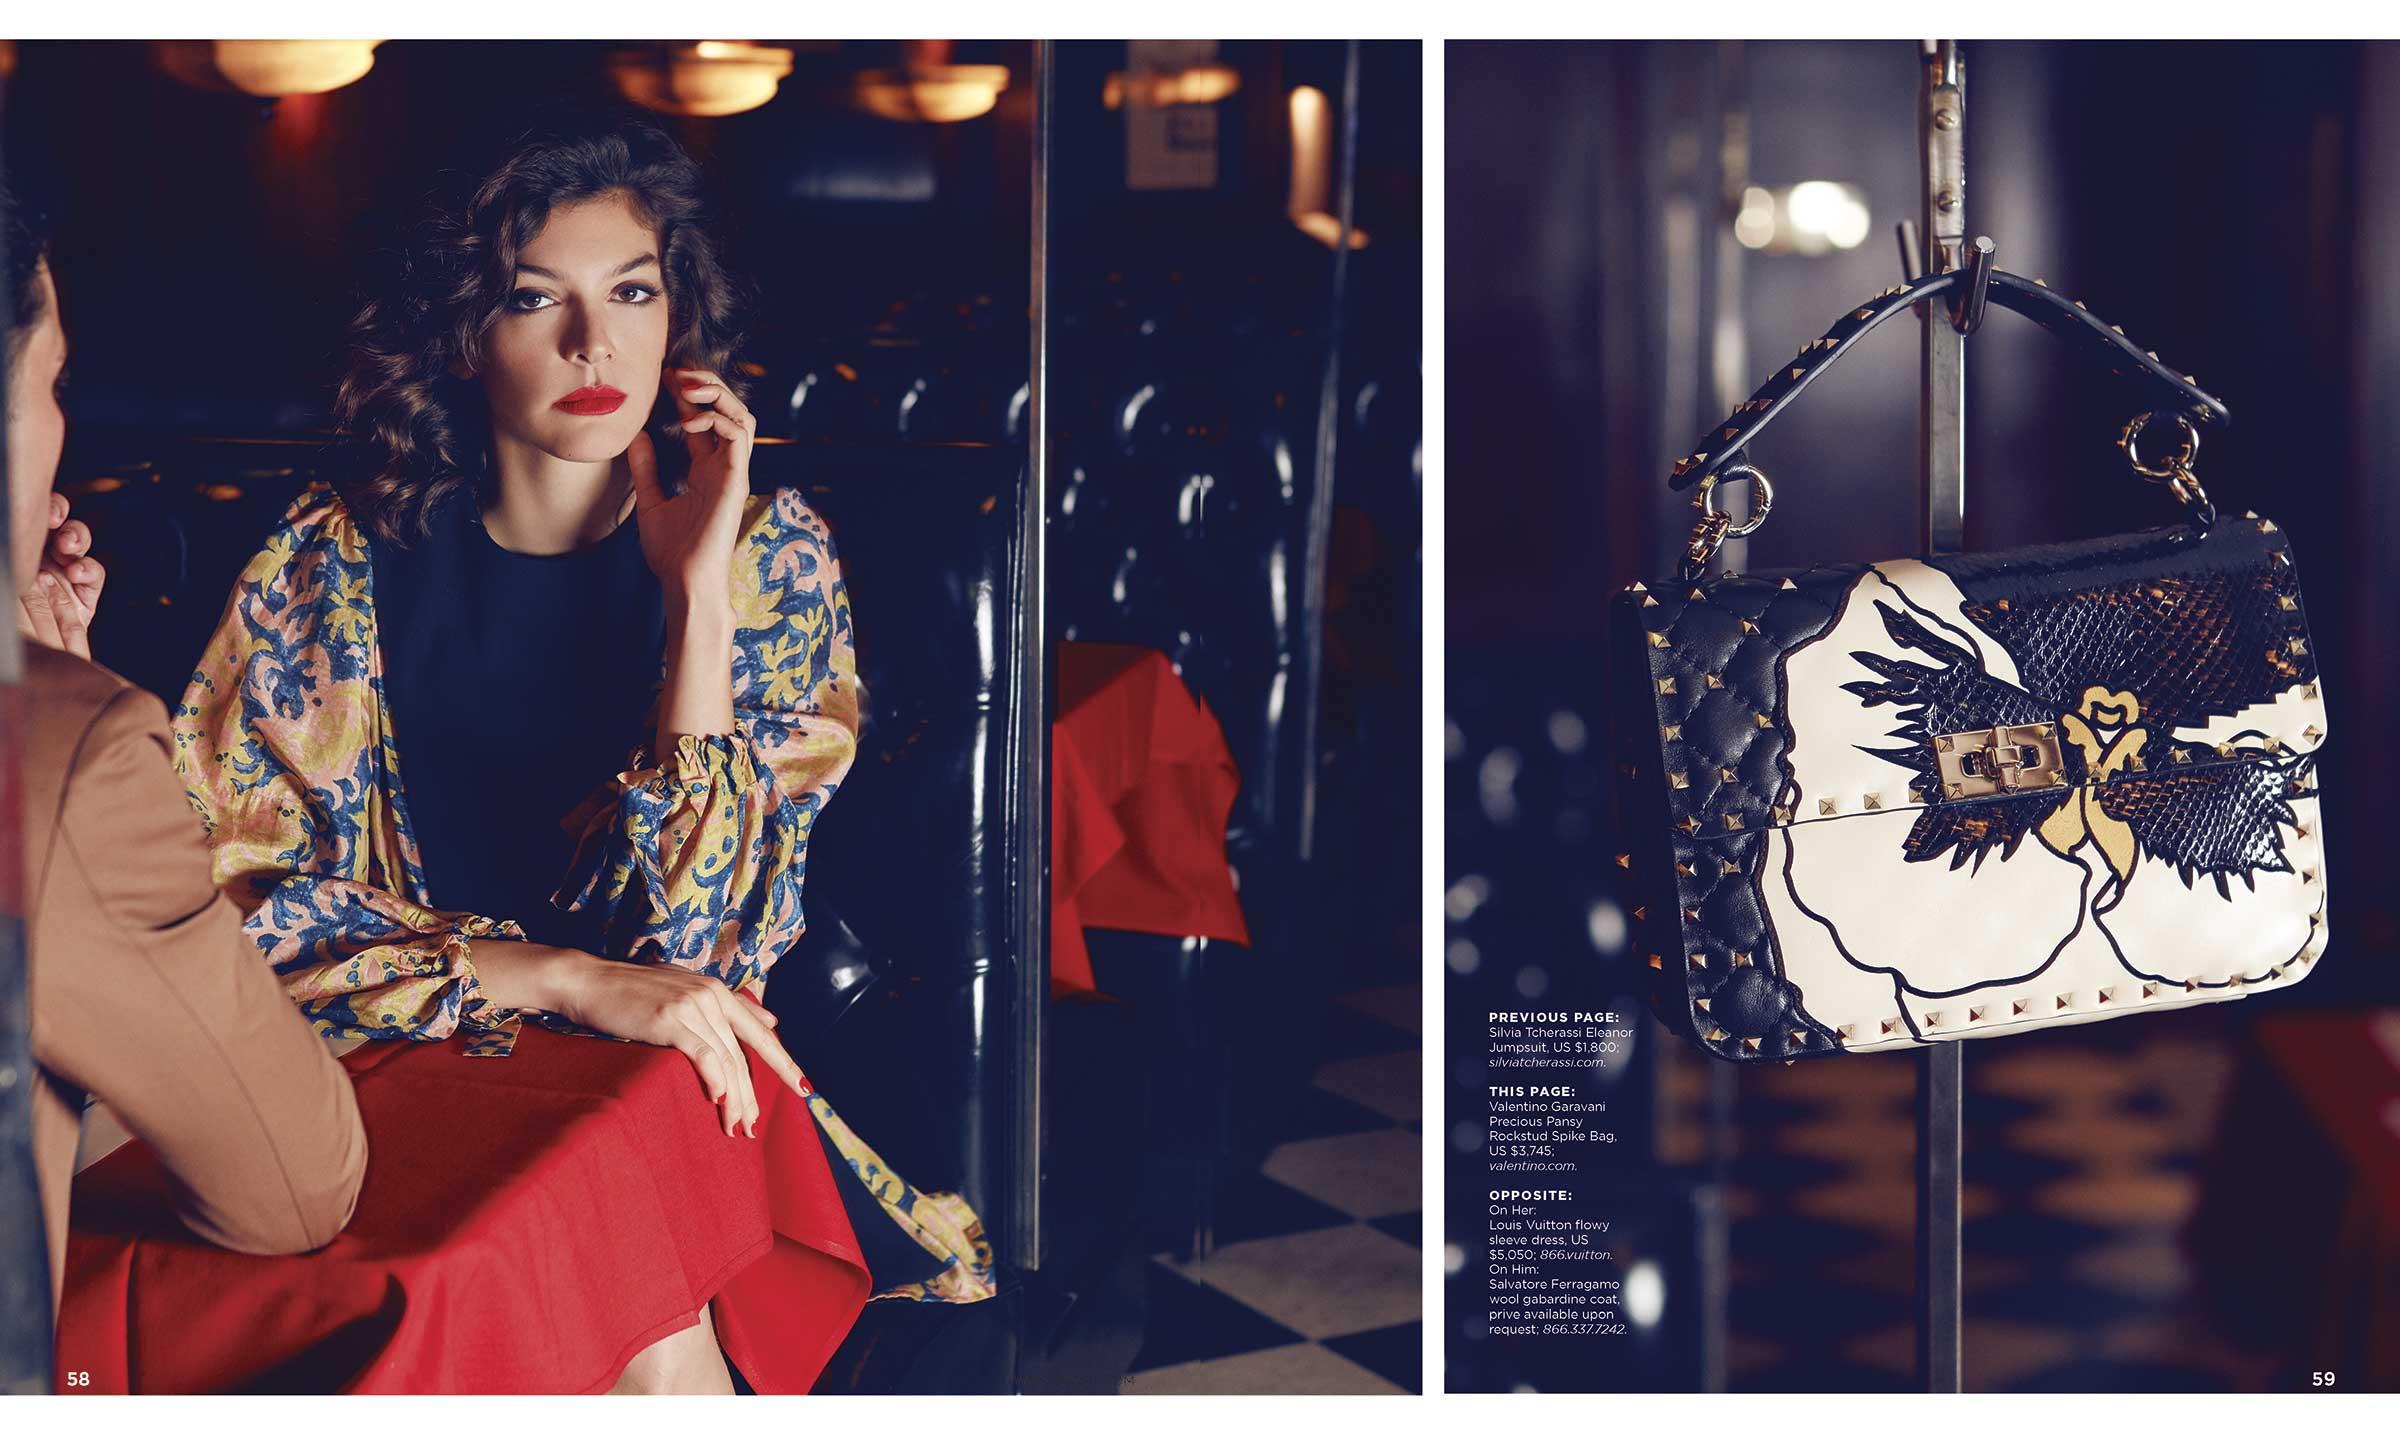 Fashion Story - Cover Story - JW Marriott Magazine - Essex House I Greg Sorensen I Fashion & Beauty Photographer I NYC